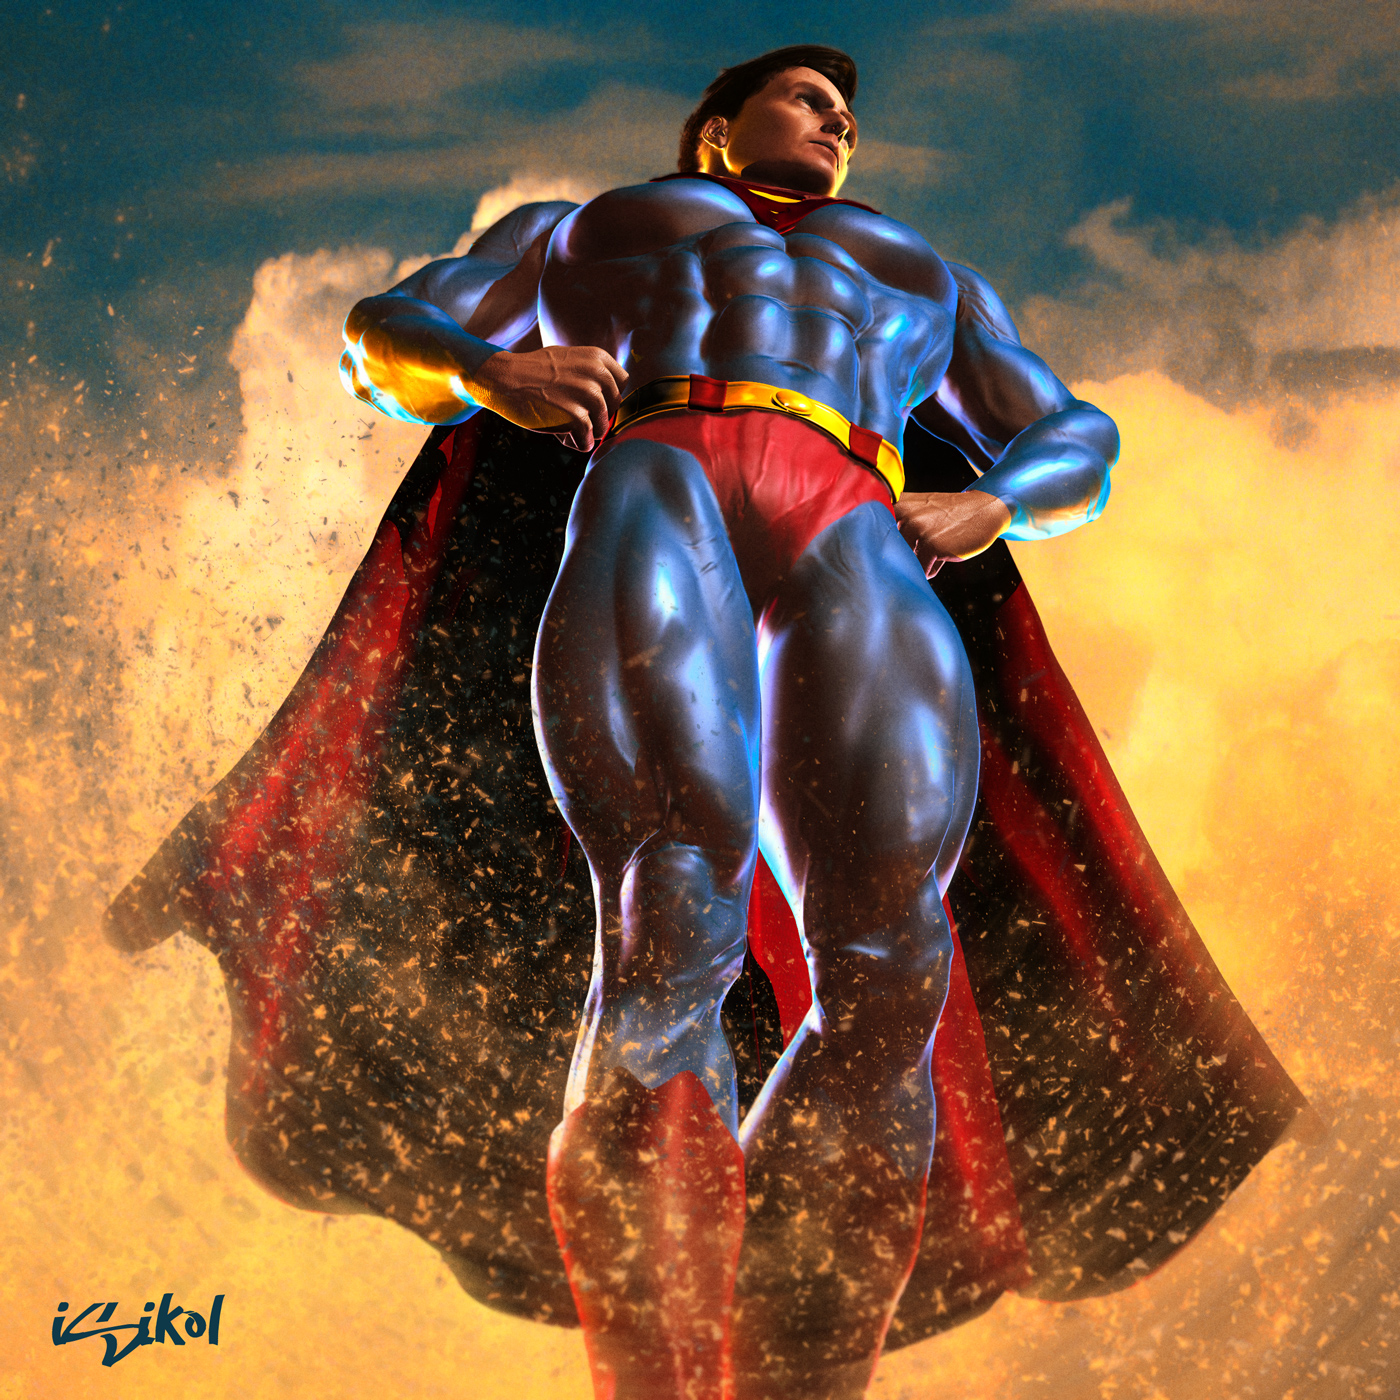 Powerful Superman